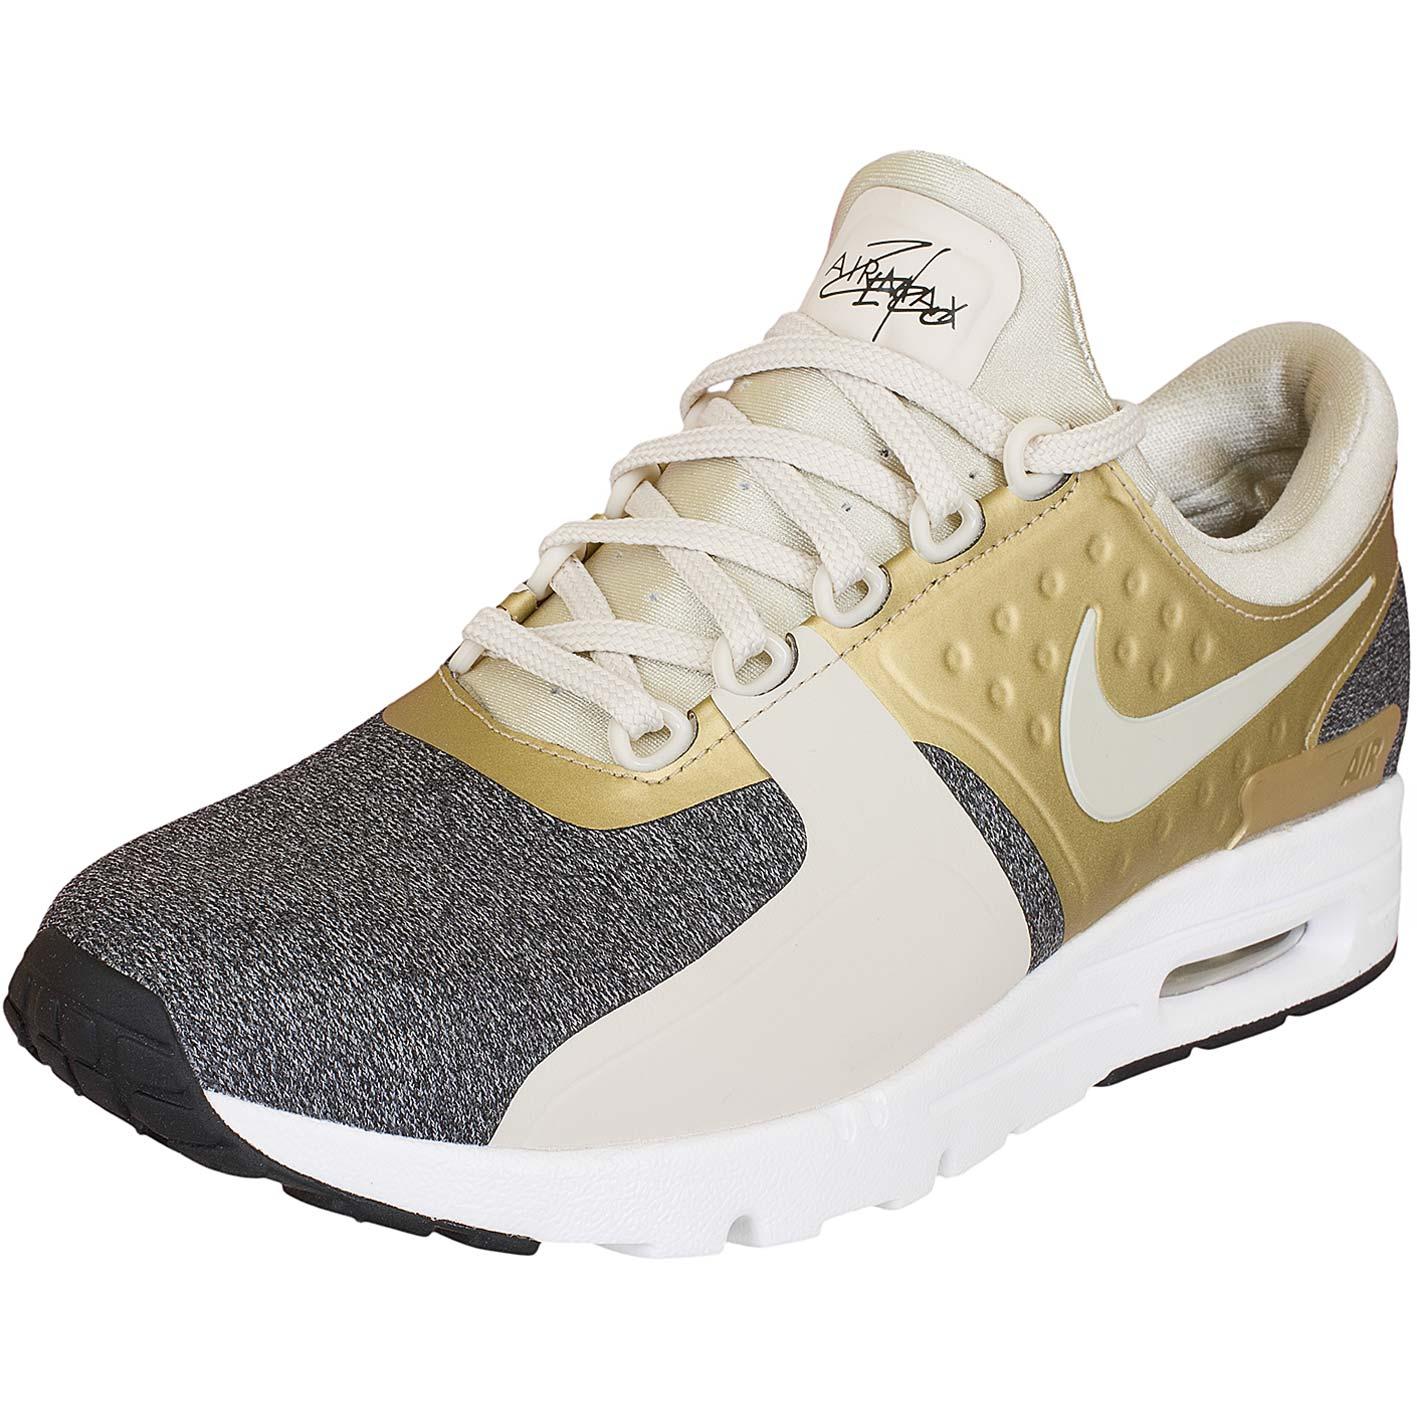 new styles b5e30 78b6a ... cheapest nike damen sneaker air max zero premium orewood 3d1b2 03687